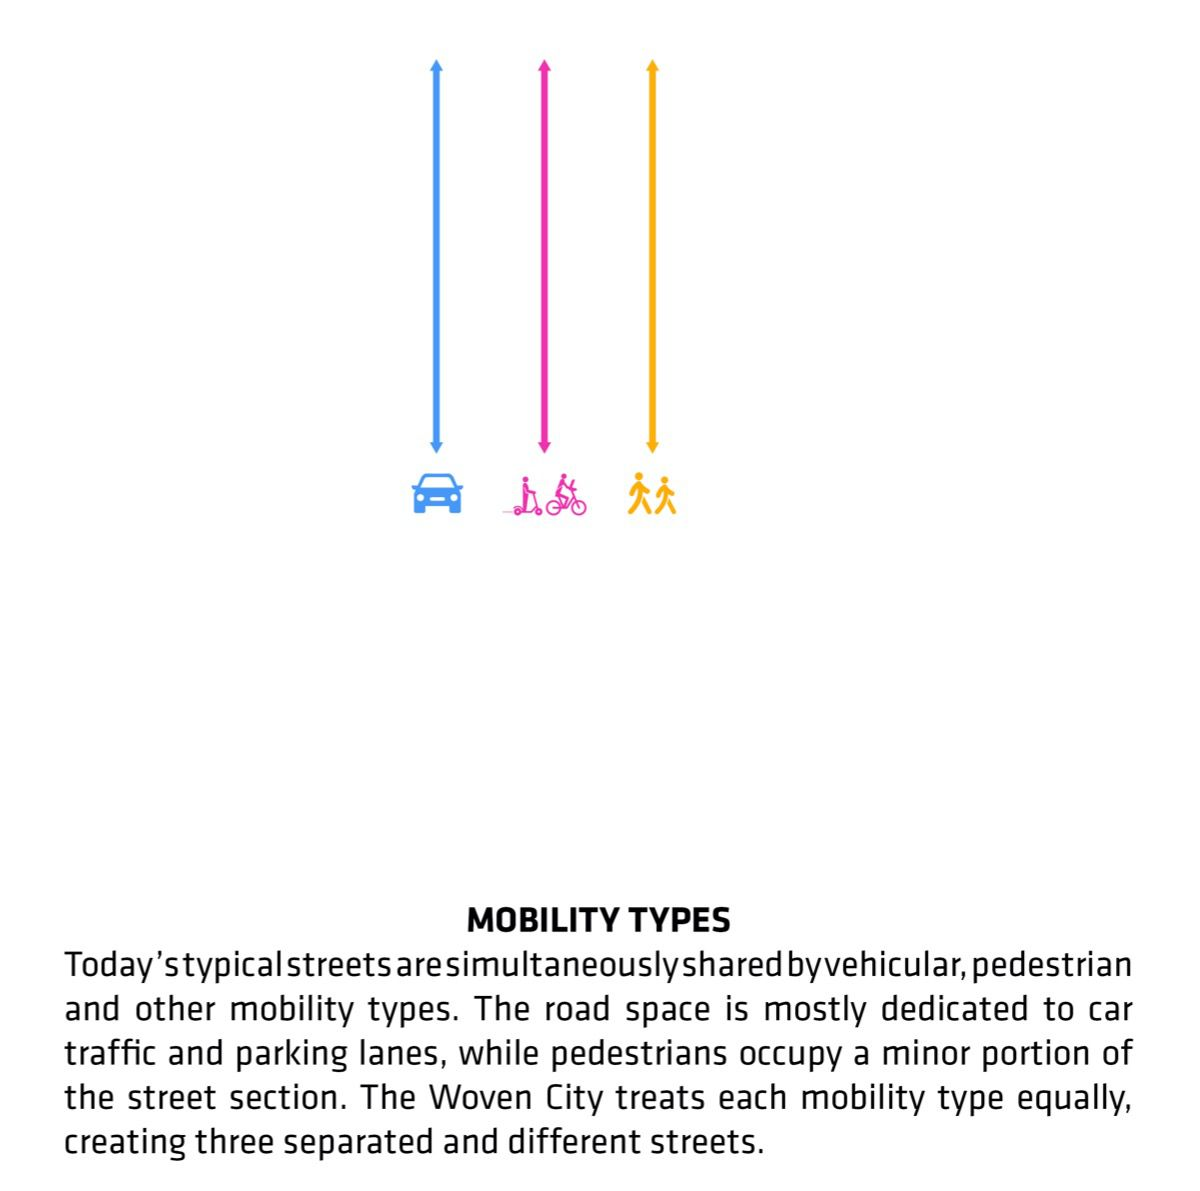 Separating modes of transport